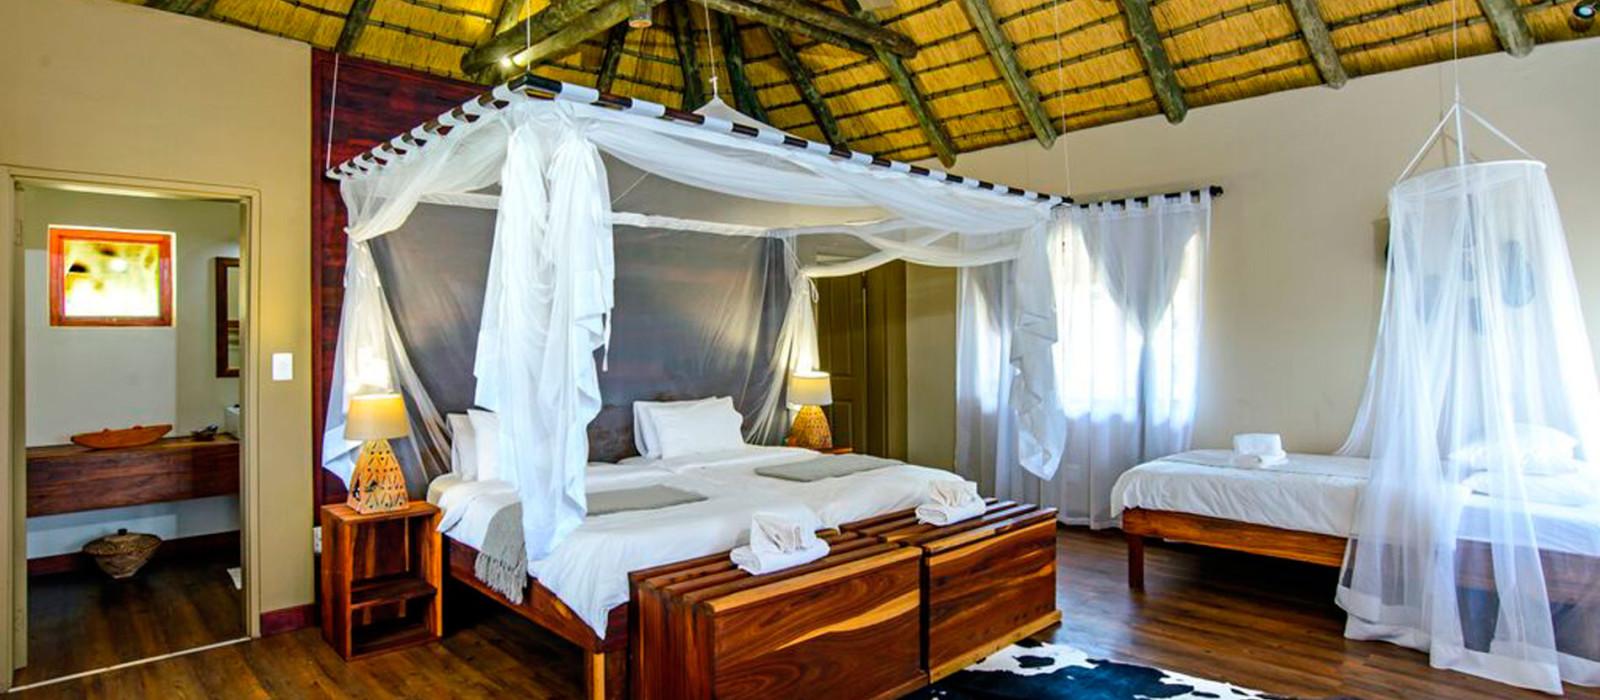 Hotel Hakusembe River Lodge Namibia